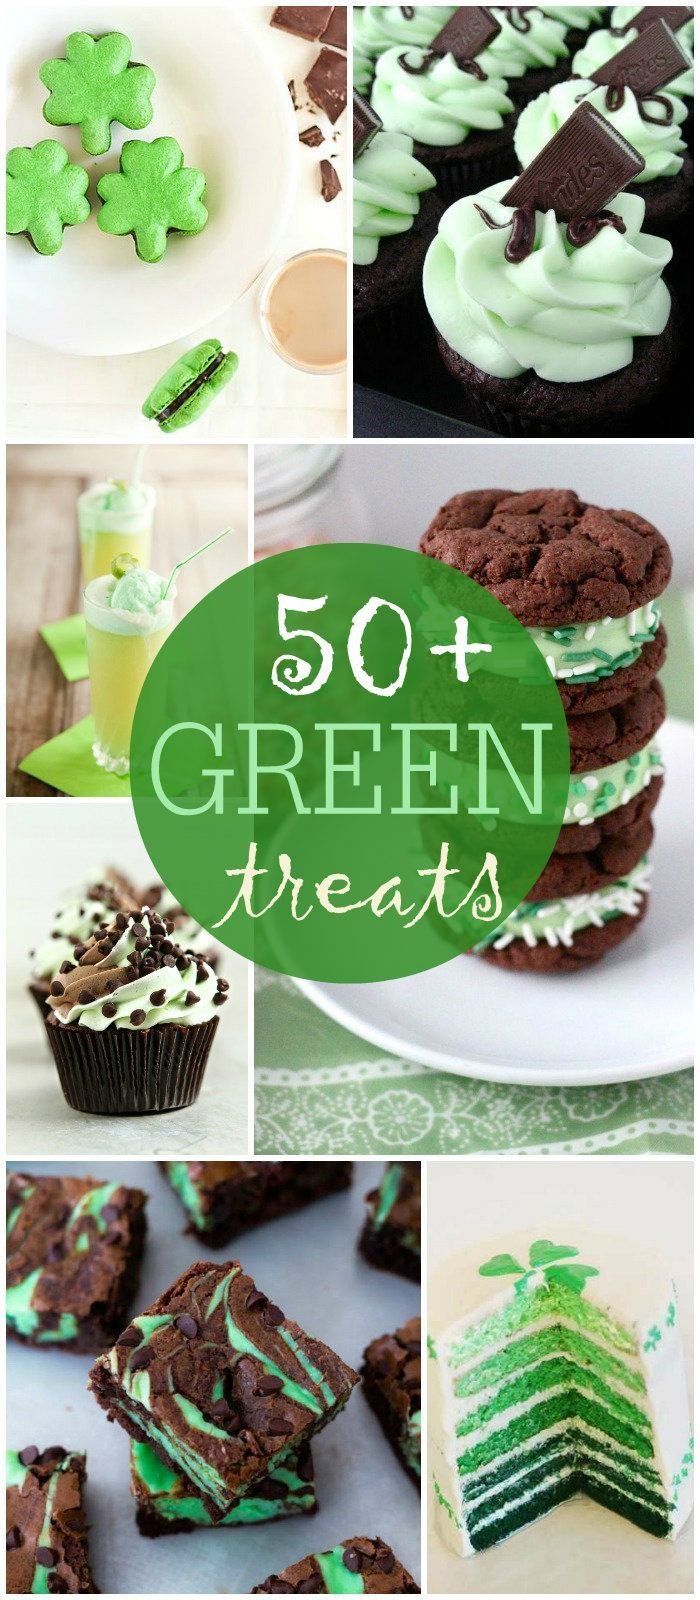 50+ Green Treats perfect for St. Patrick's Day { lilluna.com } #stpatricksday